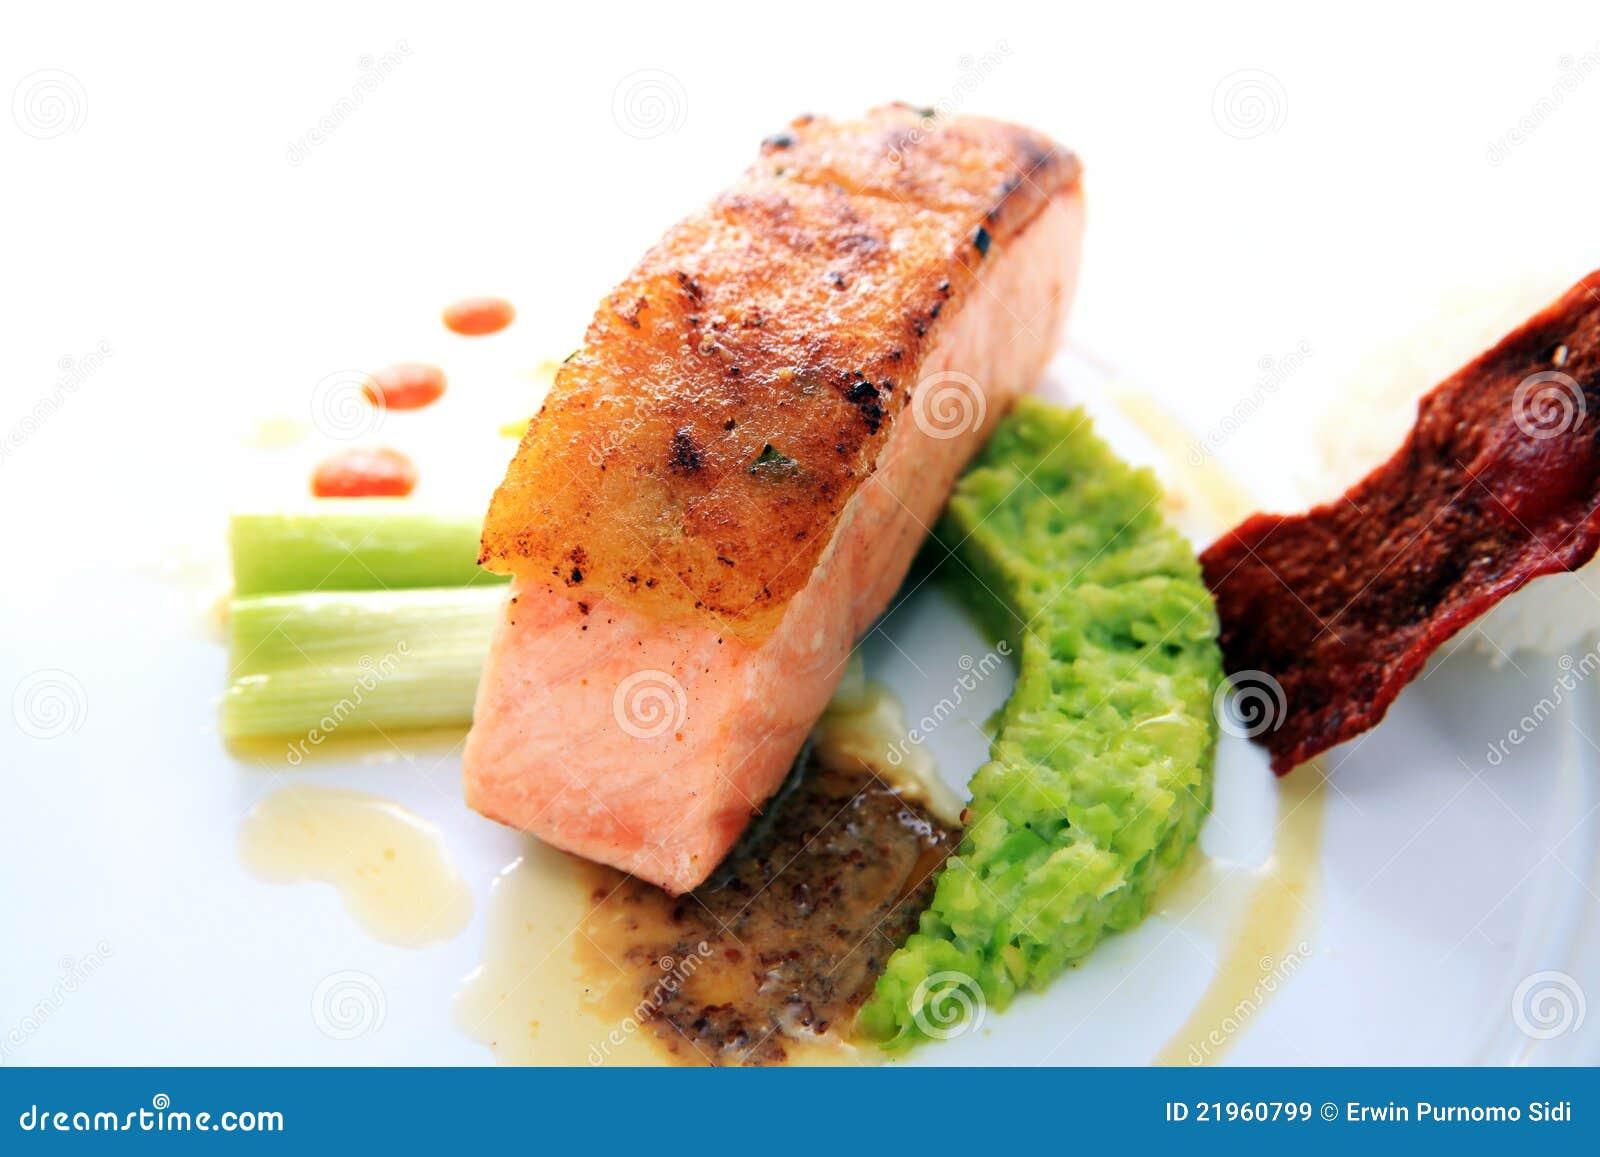 meat smoked fish